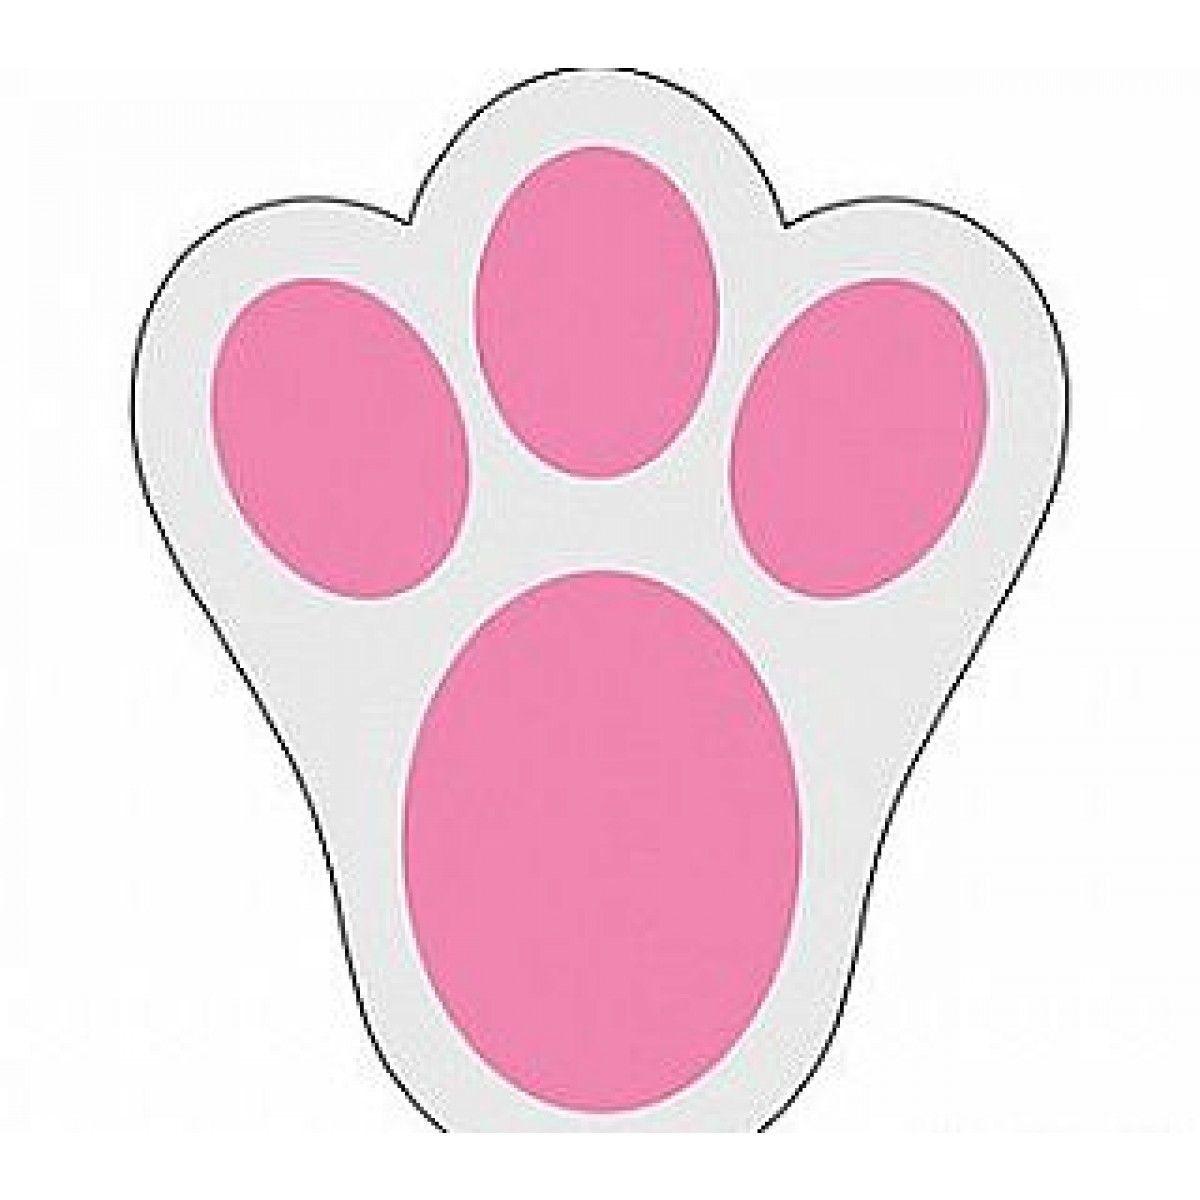 12 Large Easter Bunny Footprint Clings for Egg Hunts.